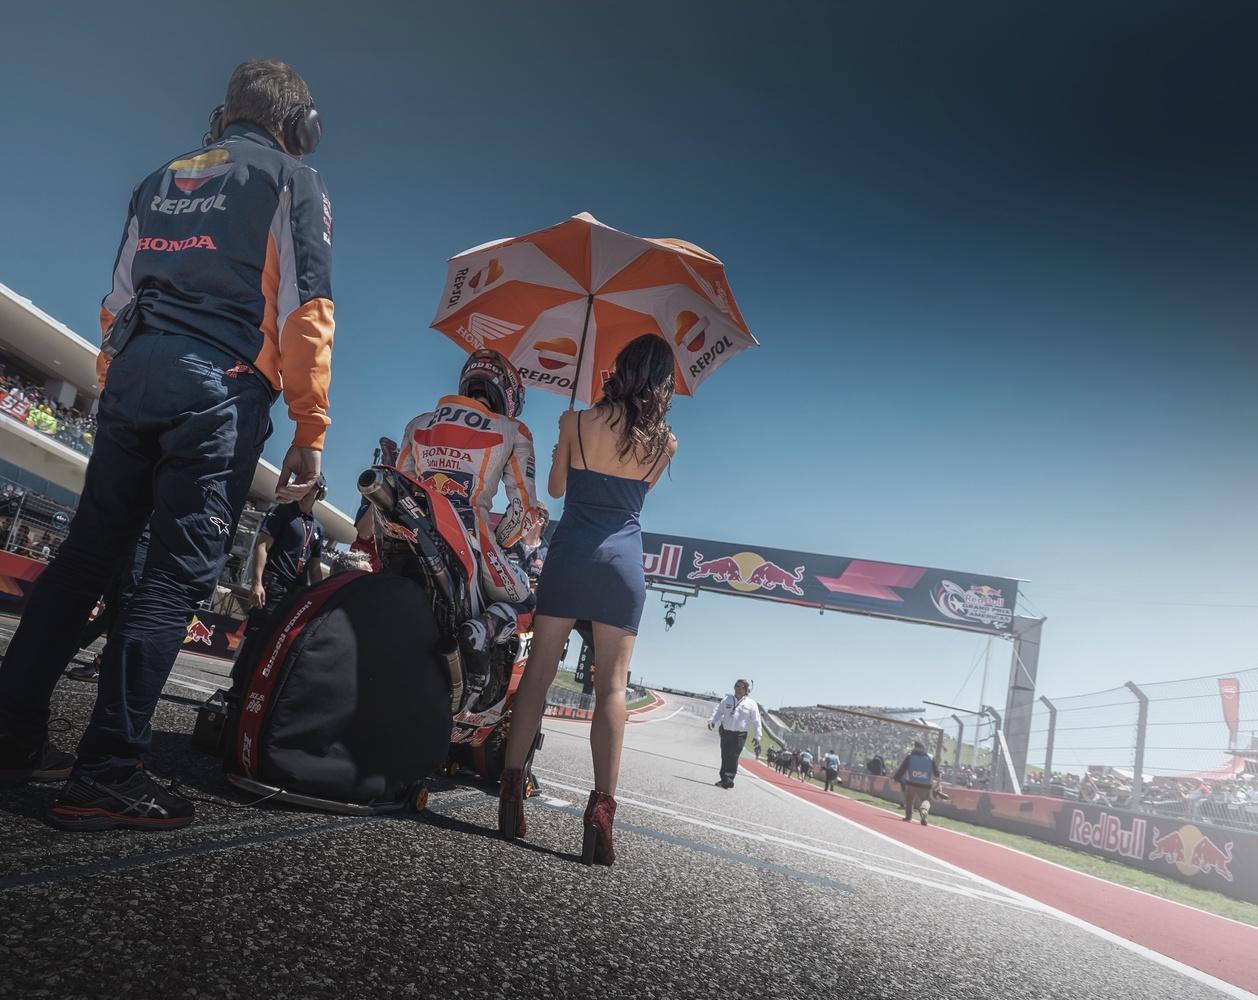 Marc Marquez Repsol Honda by Zachary Bolena